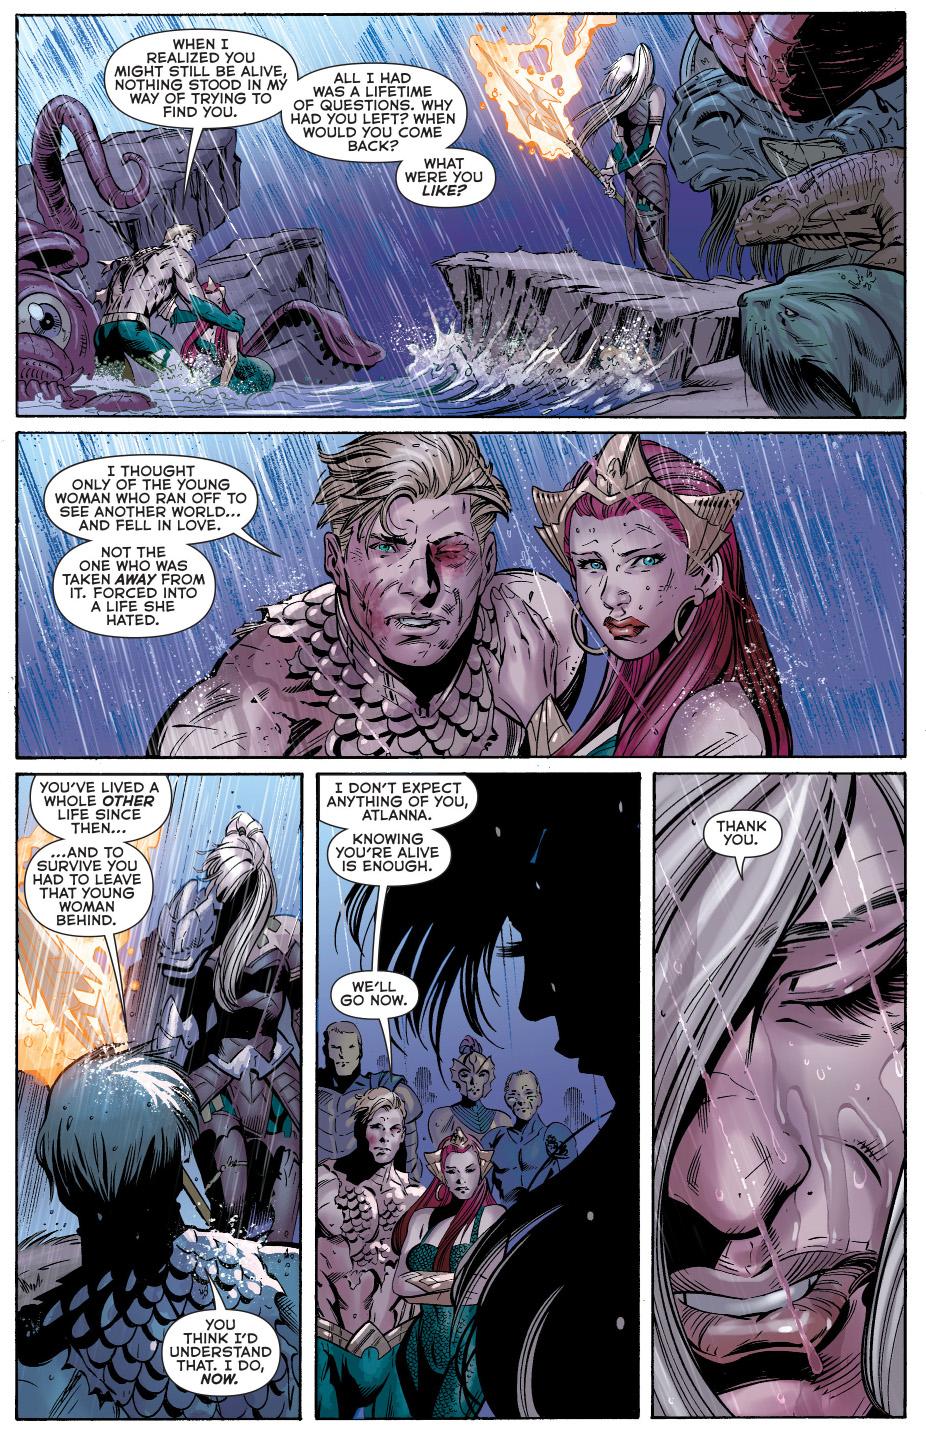 aquaman convinces atlanna of his identity